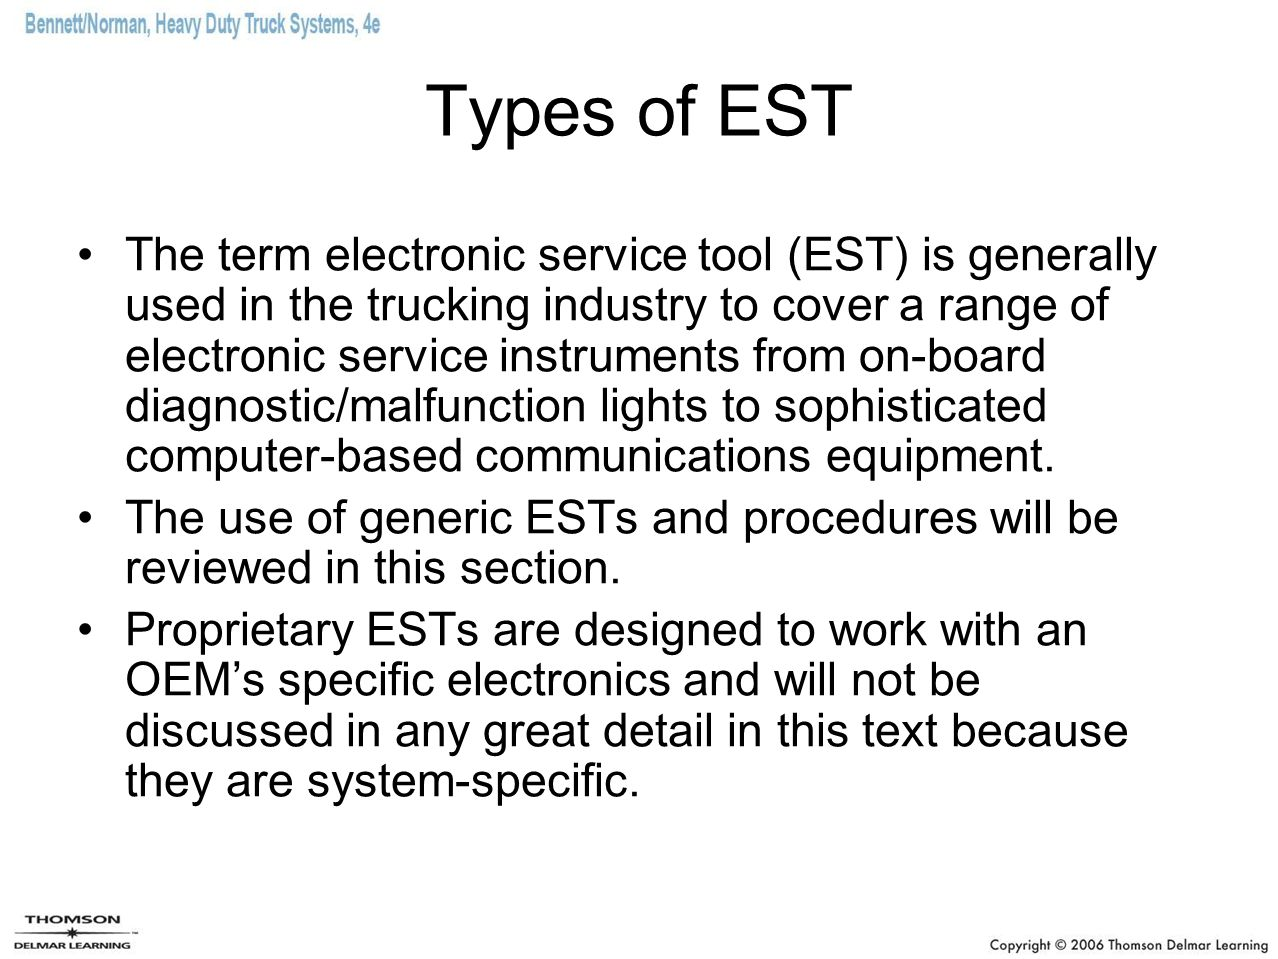 Types of EST